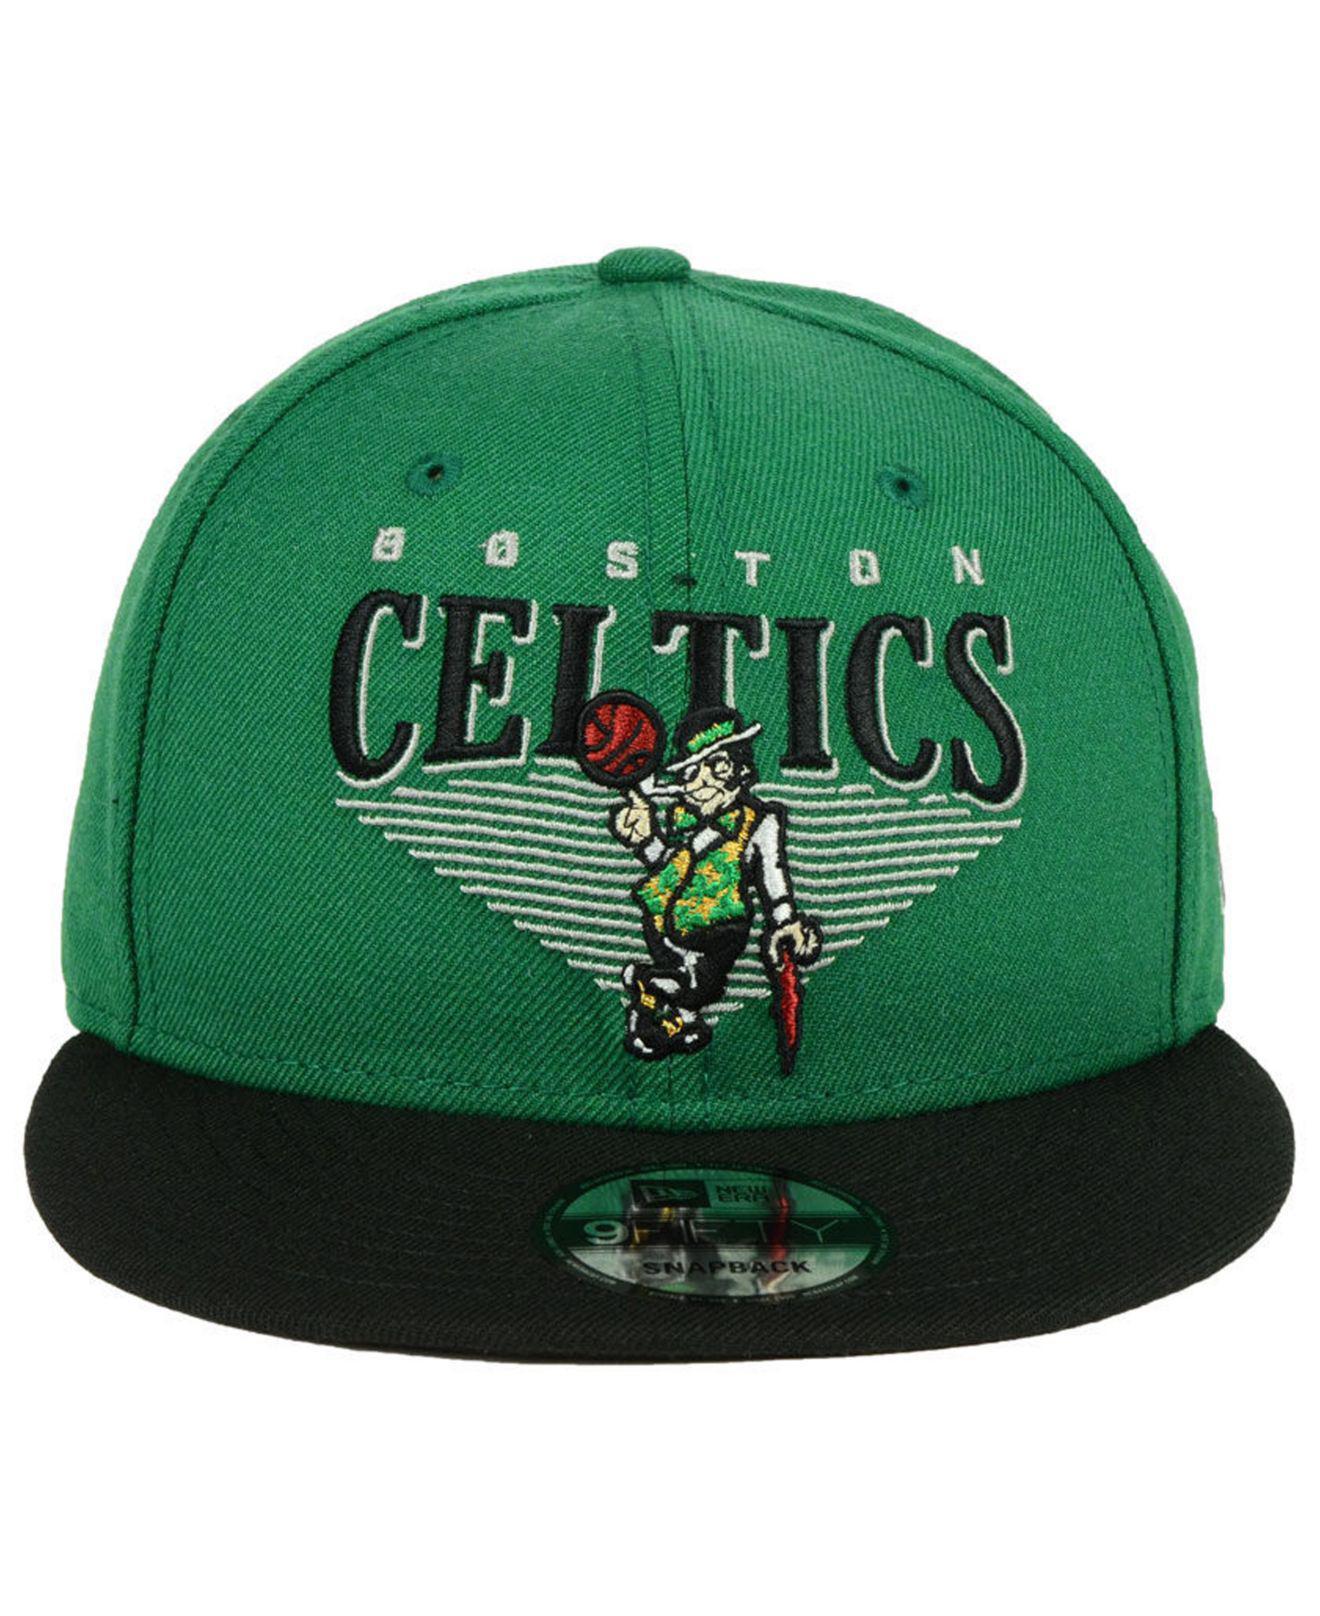 3a376fa9ba6ba7 ... coupon code for lyst ktz boston celtics retro triangle 9fifty snapback  cap in green for men